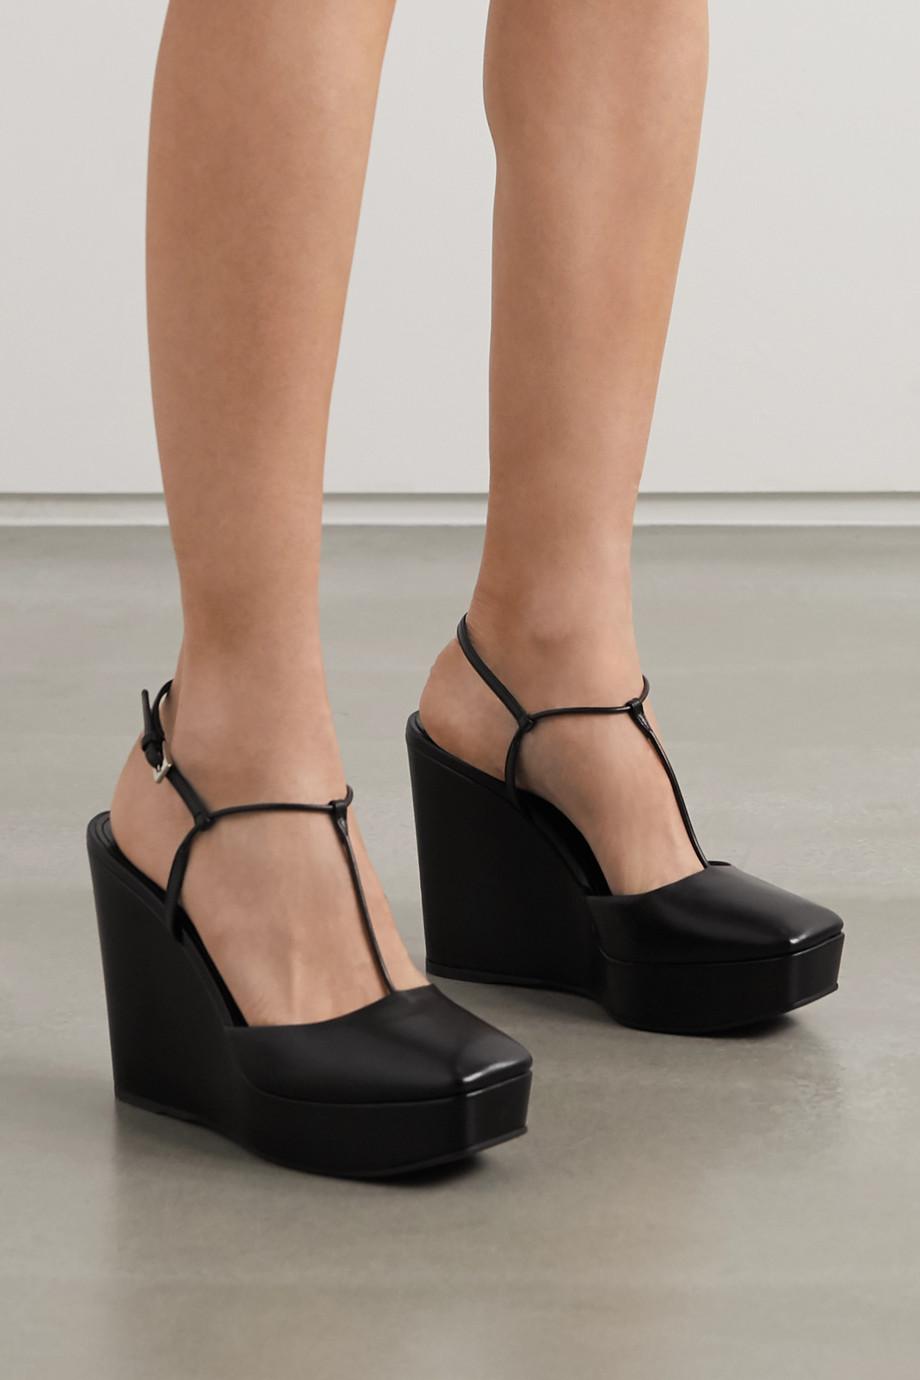 Prada 115 leather wedge sandals